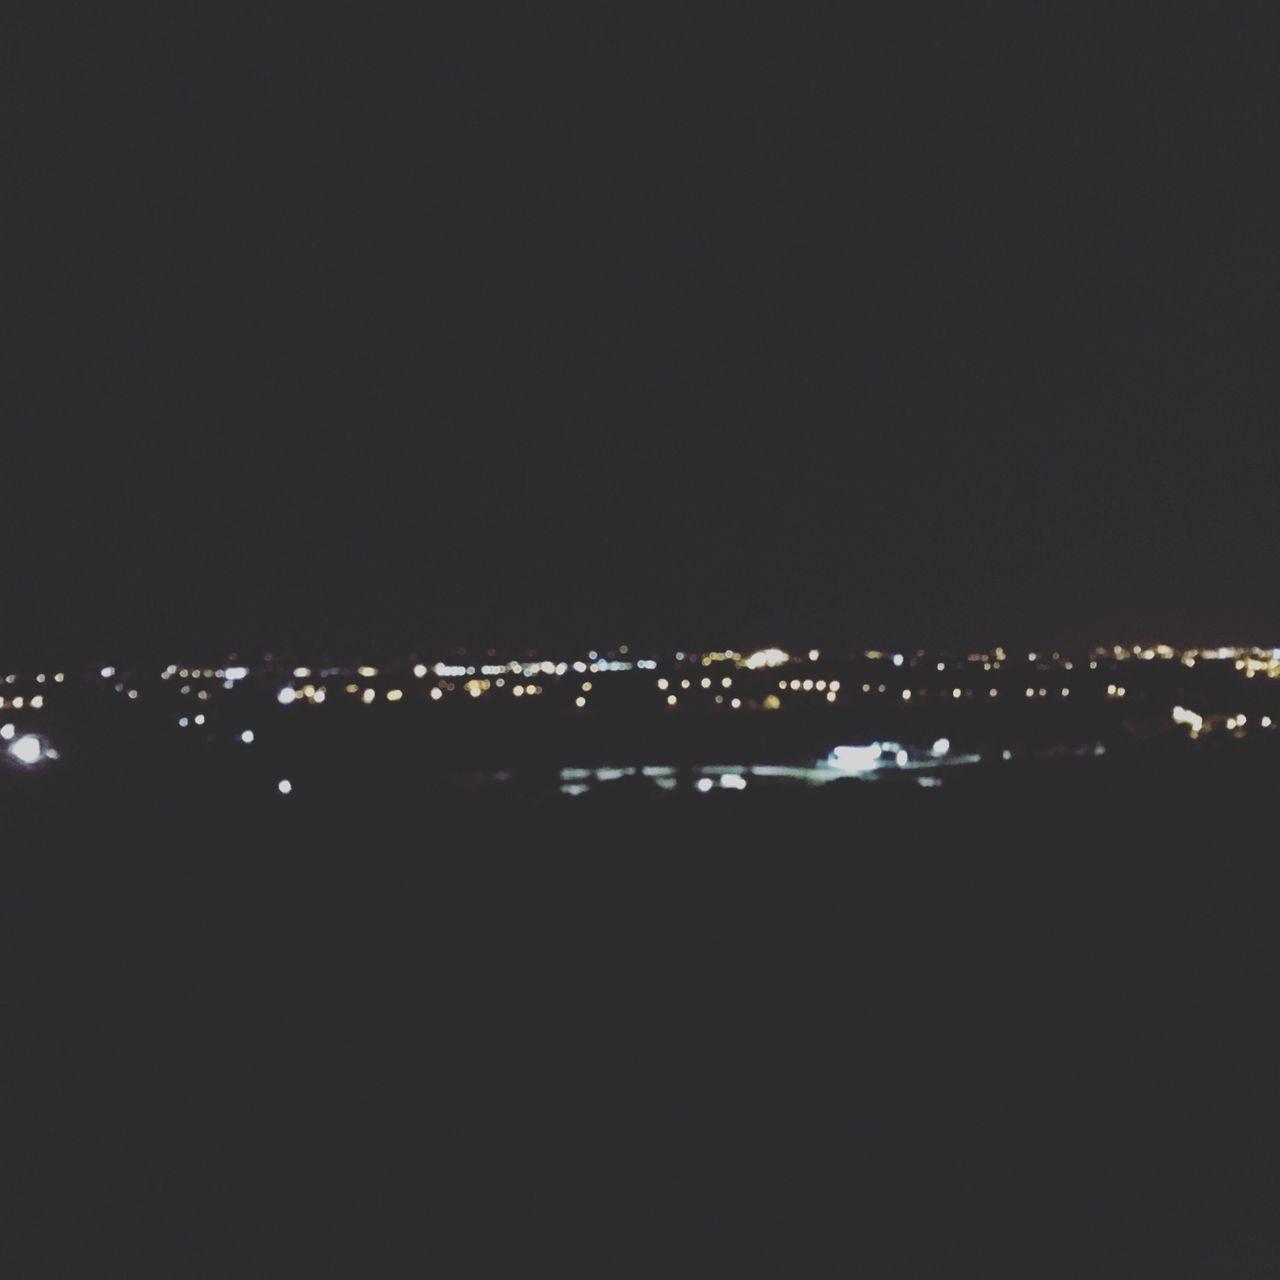 illuminated, night, no people, city, nature, outdoors, sky